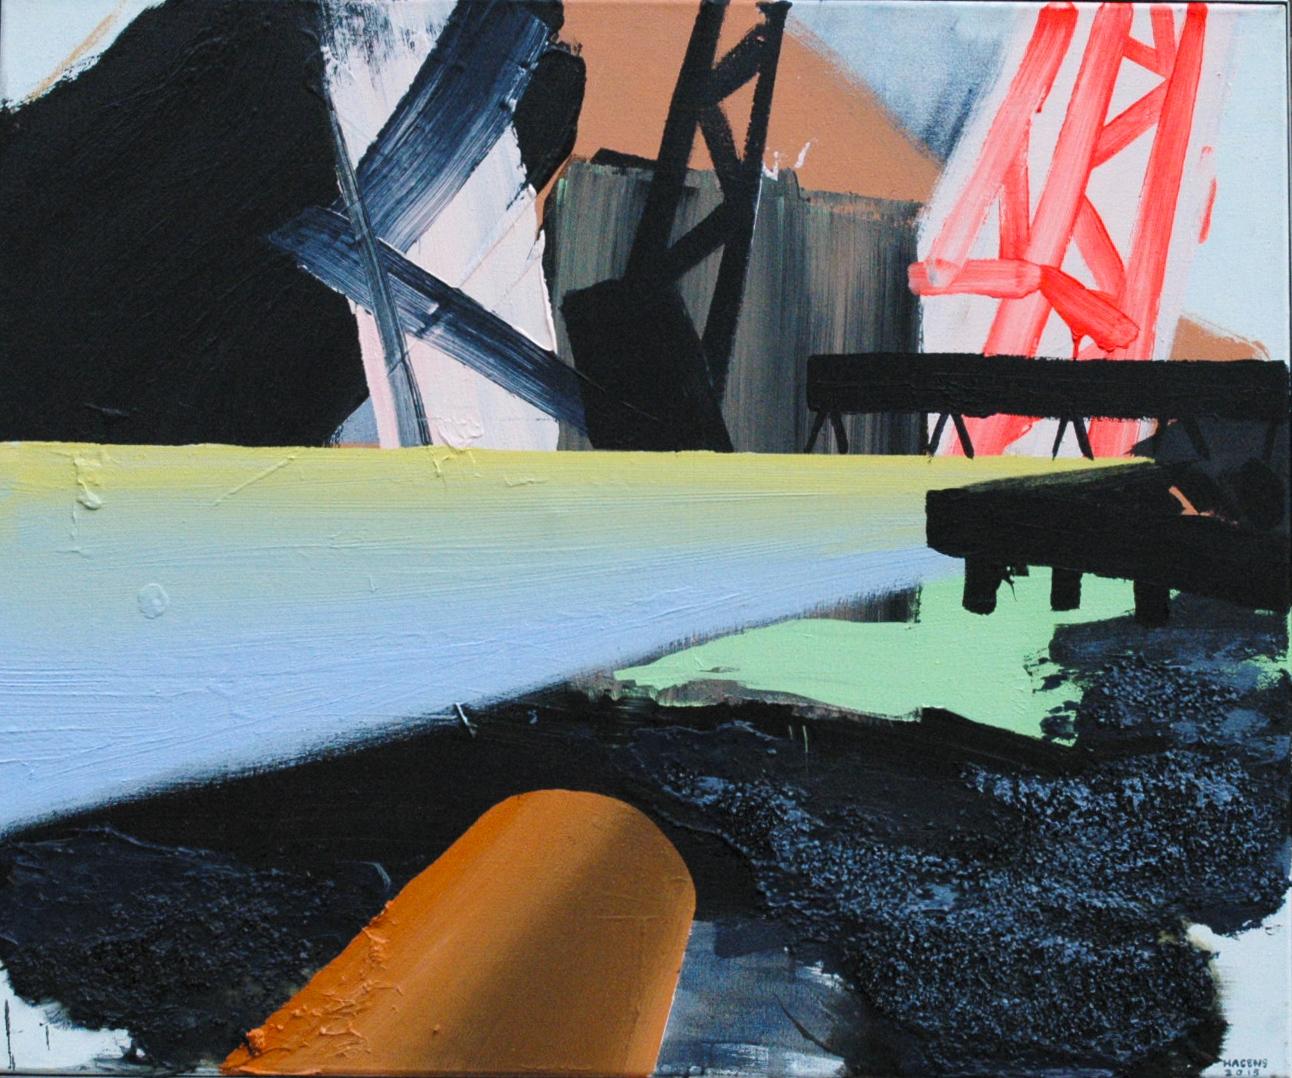 Buildingsite Oosterschelde #2 | 100 x 120 cm | Acrylicpaint & Emulsion on Canvas | 2015 | Sasja Hagens_.jpg